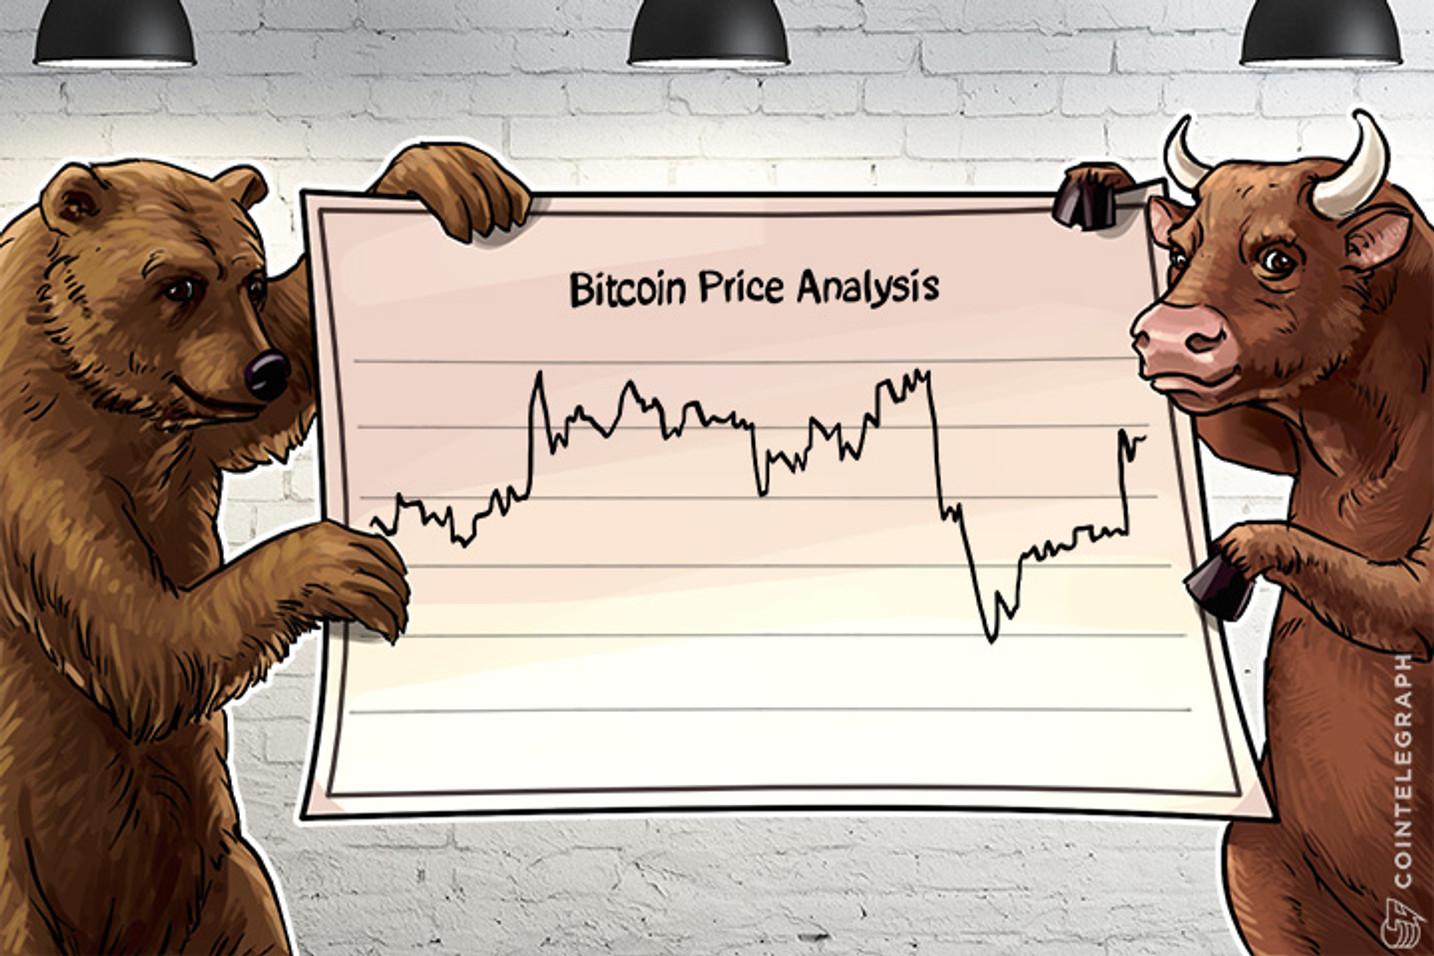 Bitcoin Price Analysis (Week of April 10th)